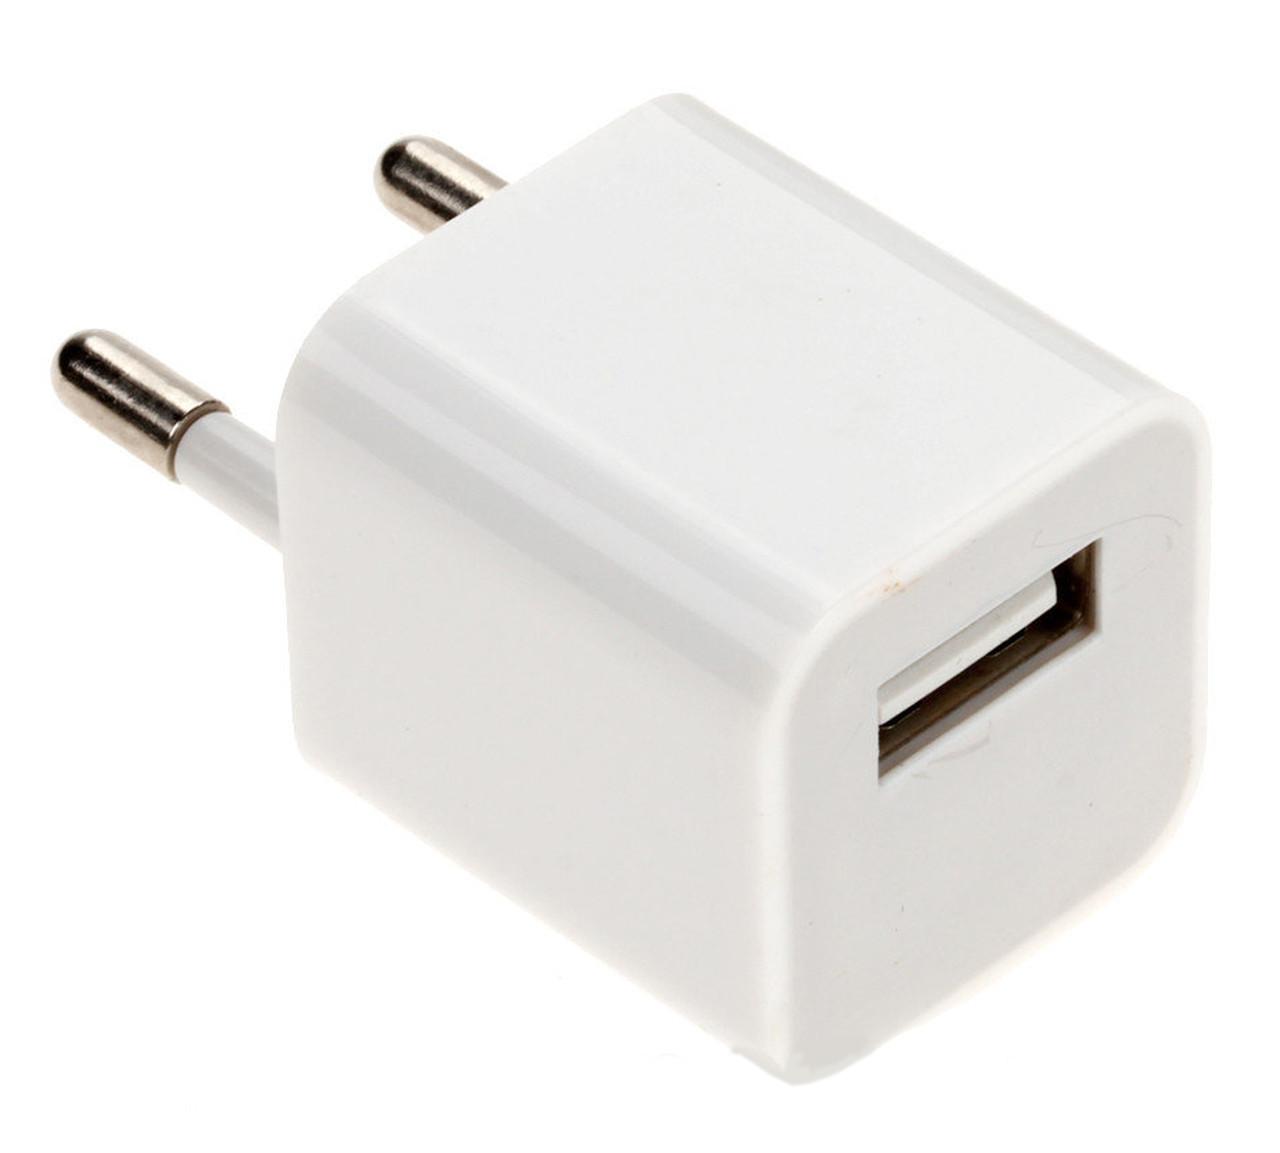 Блок питания типа iPhone 5v 1A USB адаптер (кубик)